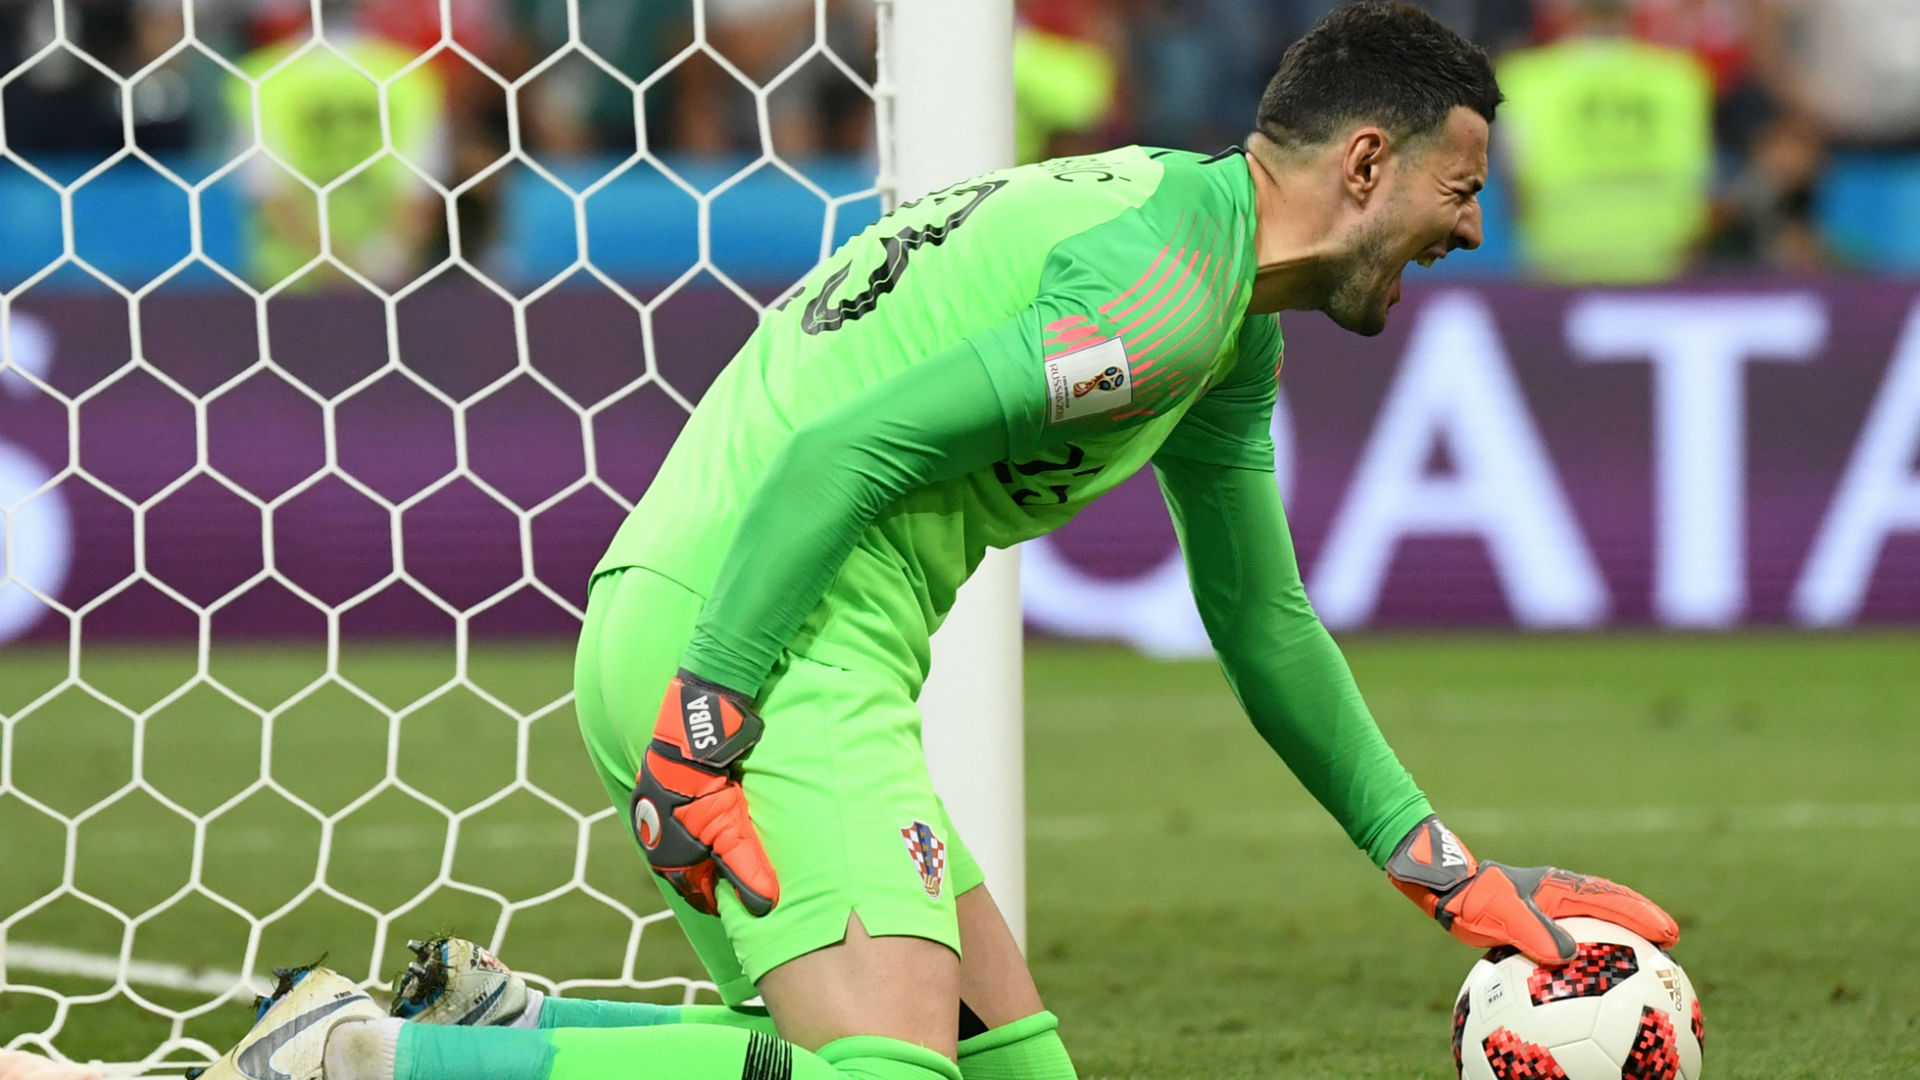 russia croatia - danijel subasic - world cup - 07072018